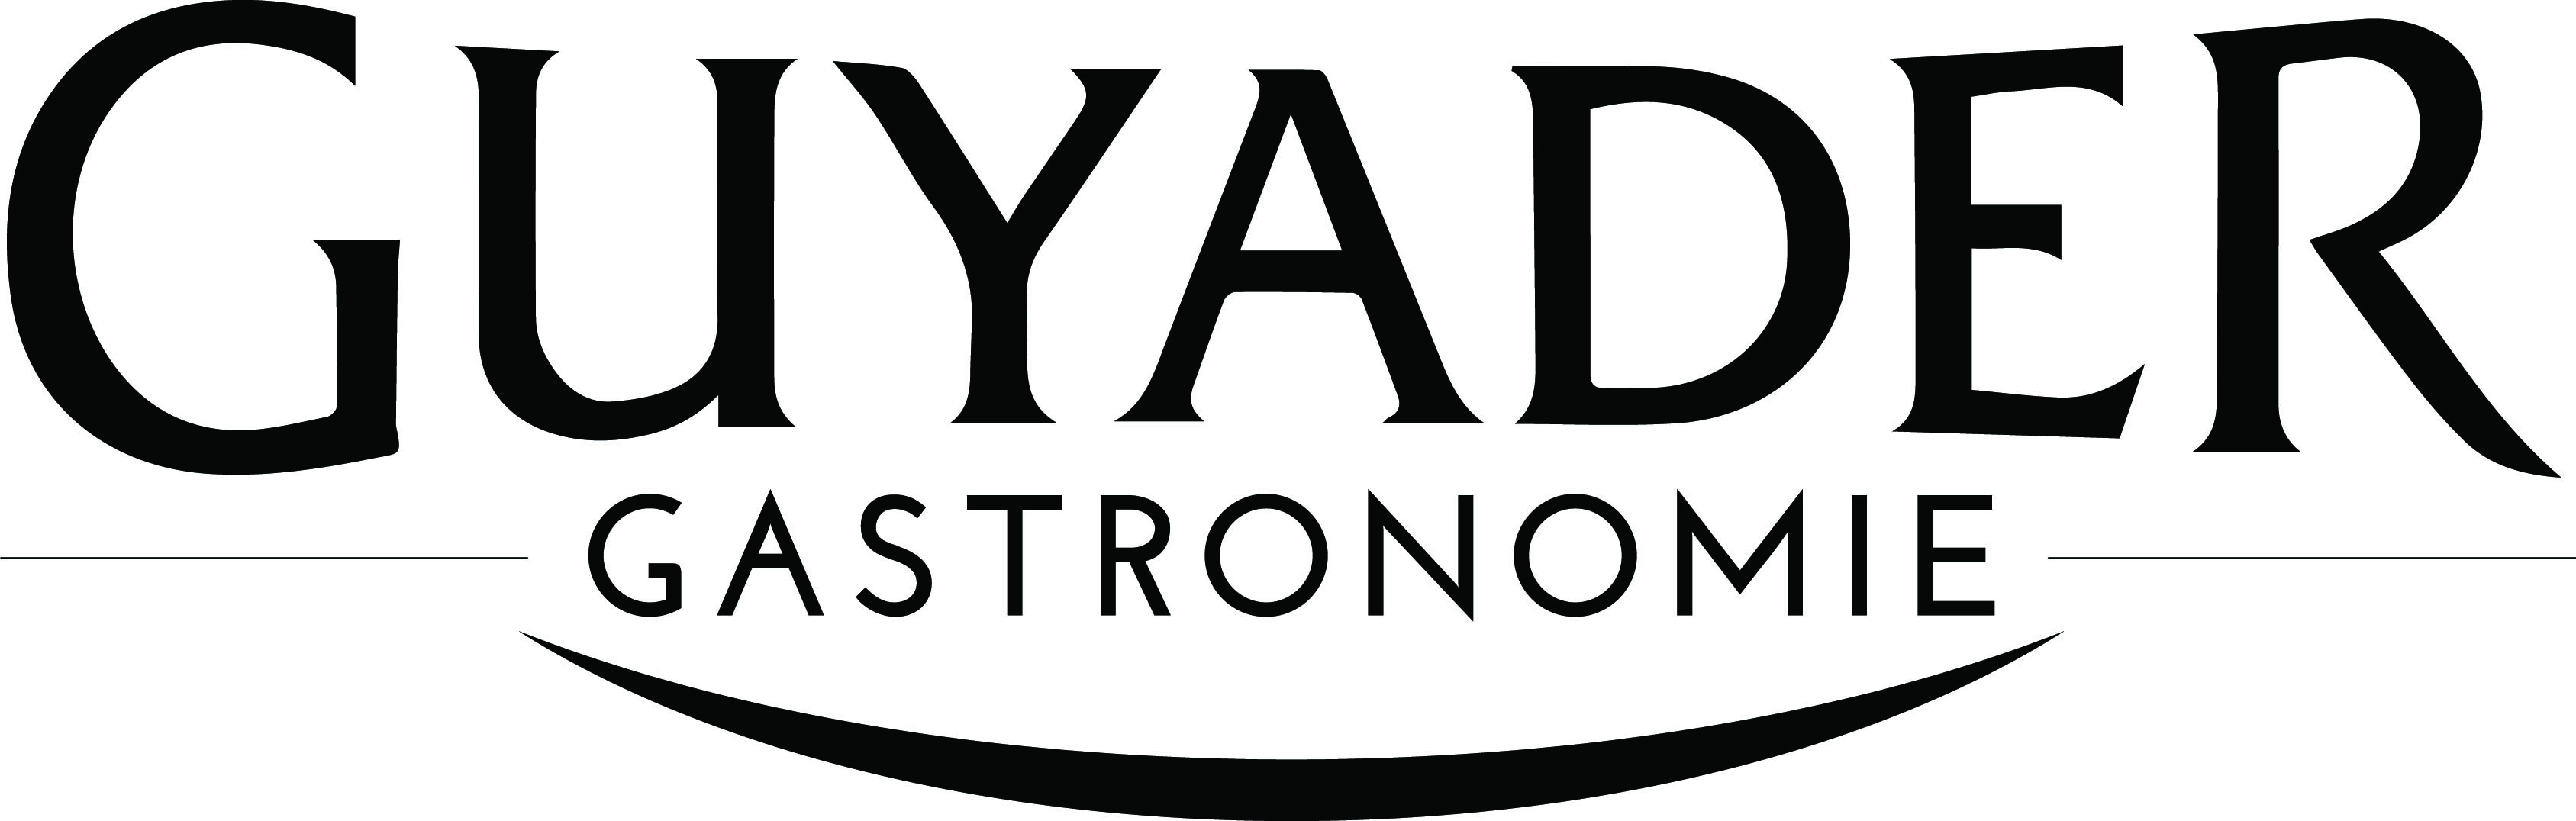 Logo Guyader Gastronomie